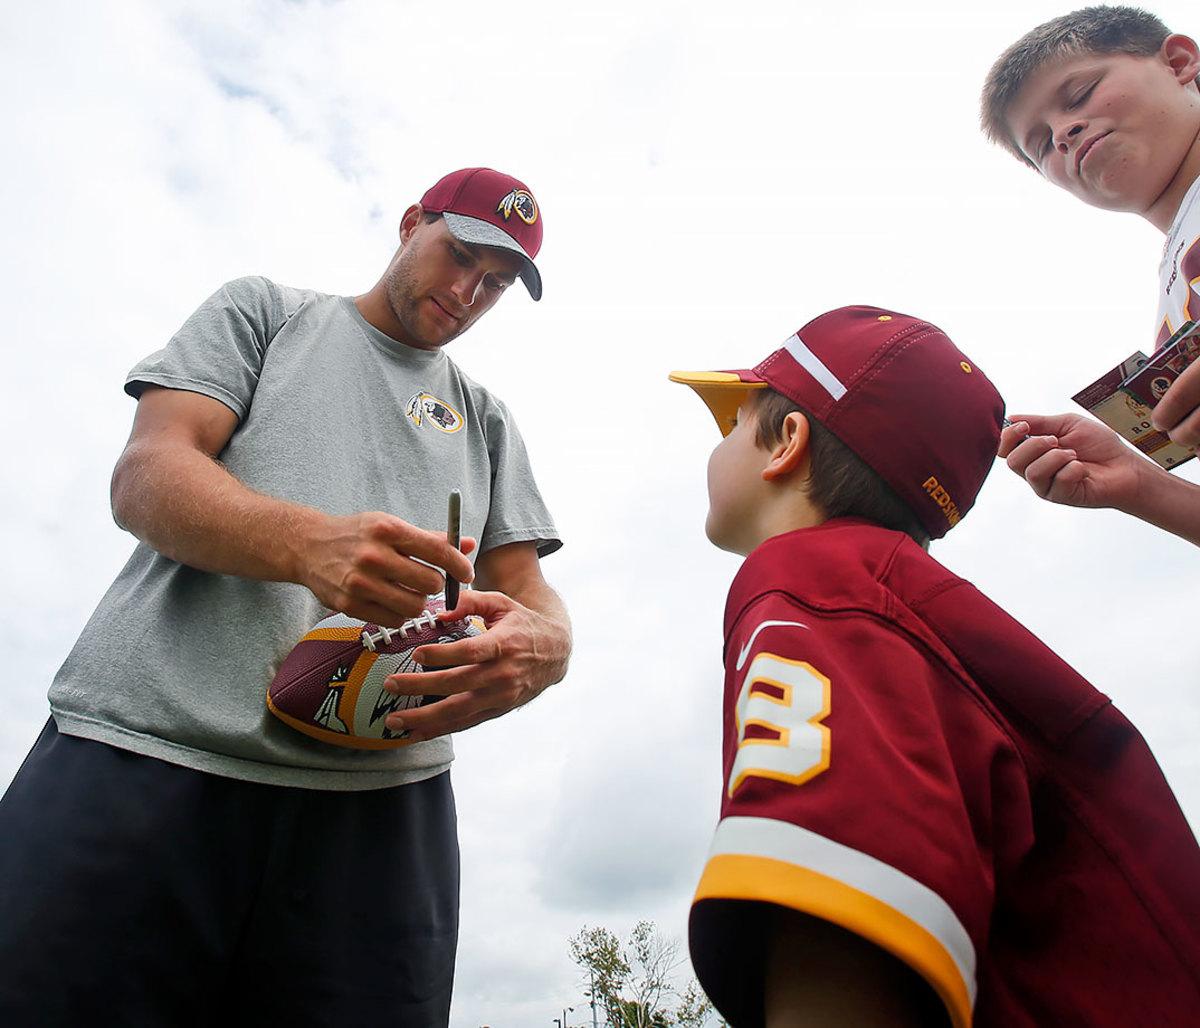 2016-0729-Washington-Redskins-training-camp-Kirk-Cousins-fans.jpg